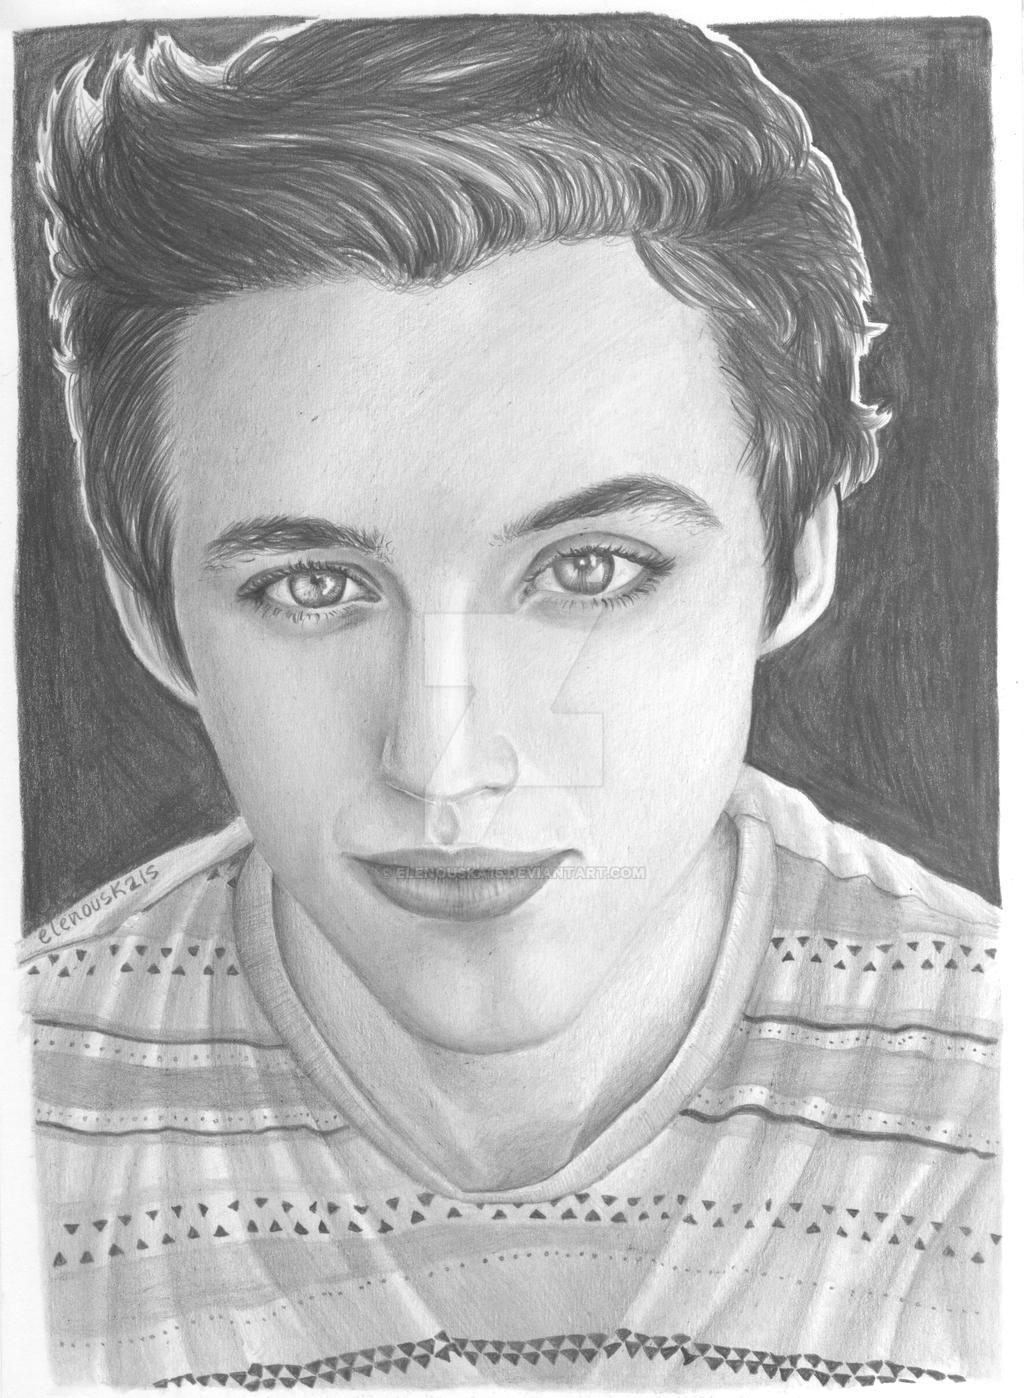 Troye Sivan Drawing by elenouska15 on DeviantArt